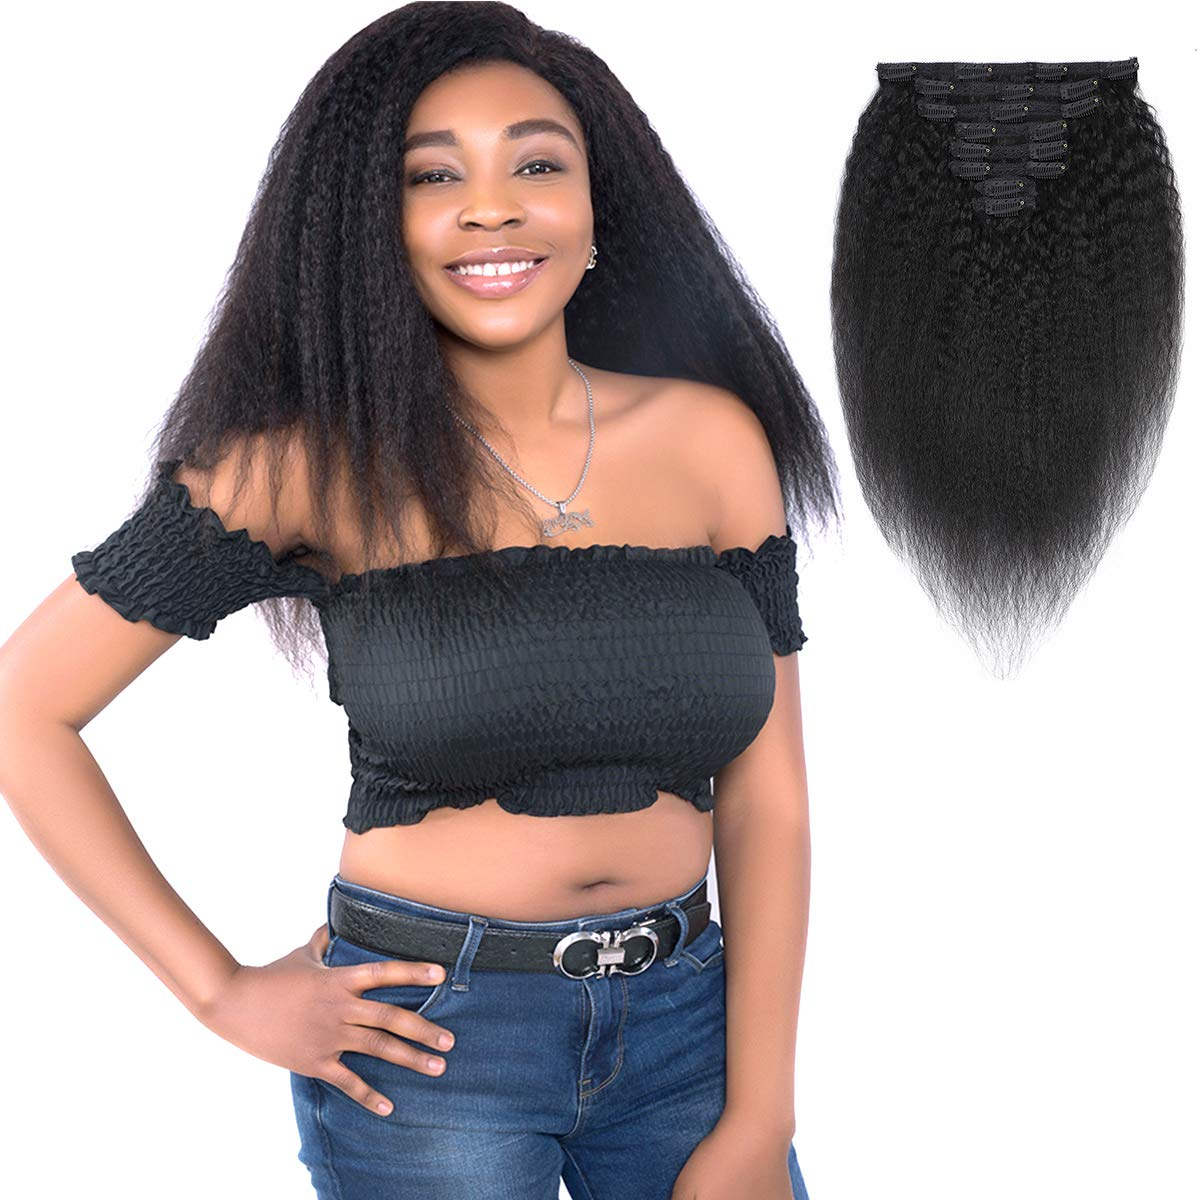 Feelgrace Clip in Hair Extension Human Hair for Women Kinky Straight Clip Ins Extension Yaki Straight Real Virgin Brazilian Hair Weft Silky Soft Clips in Human Hair Kinky Straight (16 Inch, Natural)